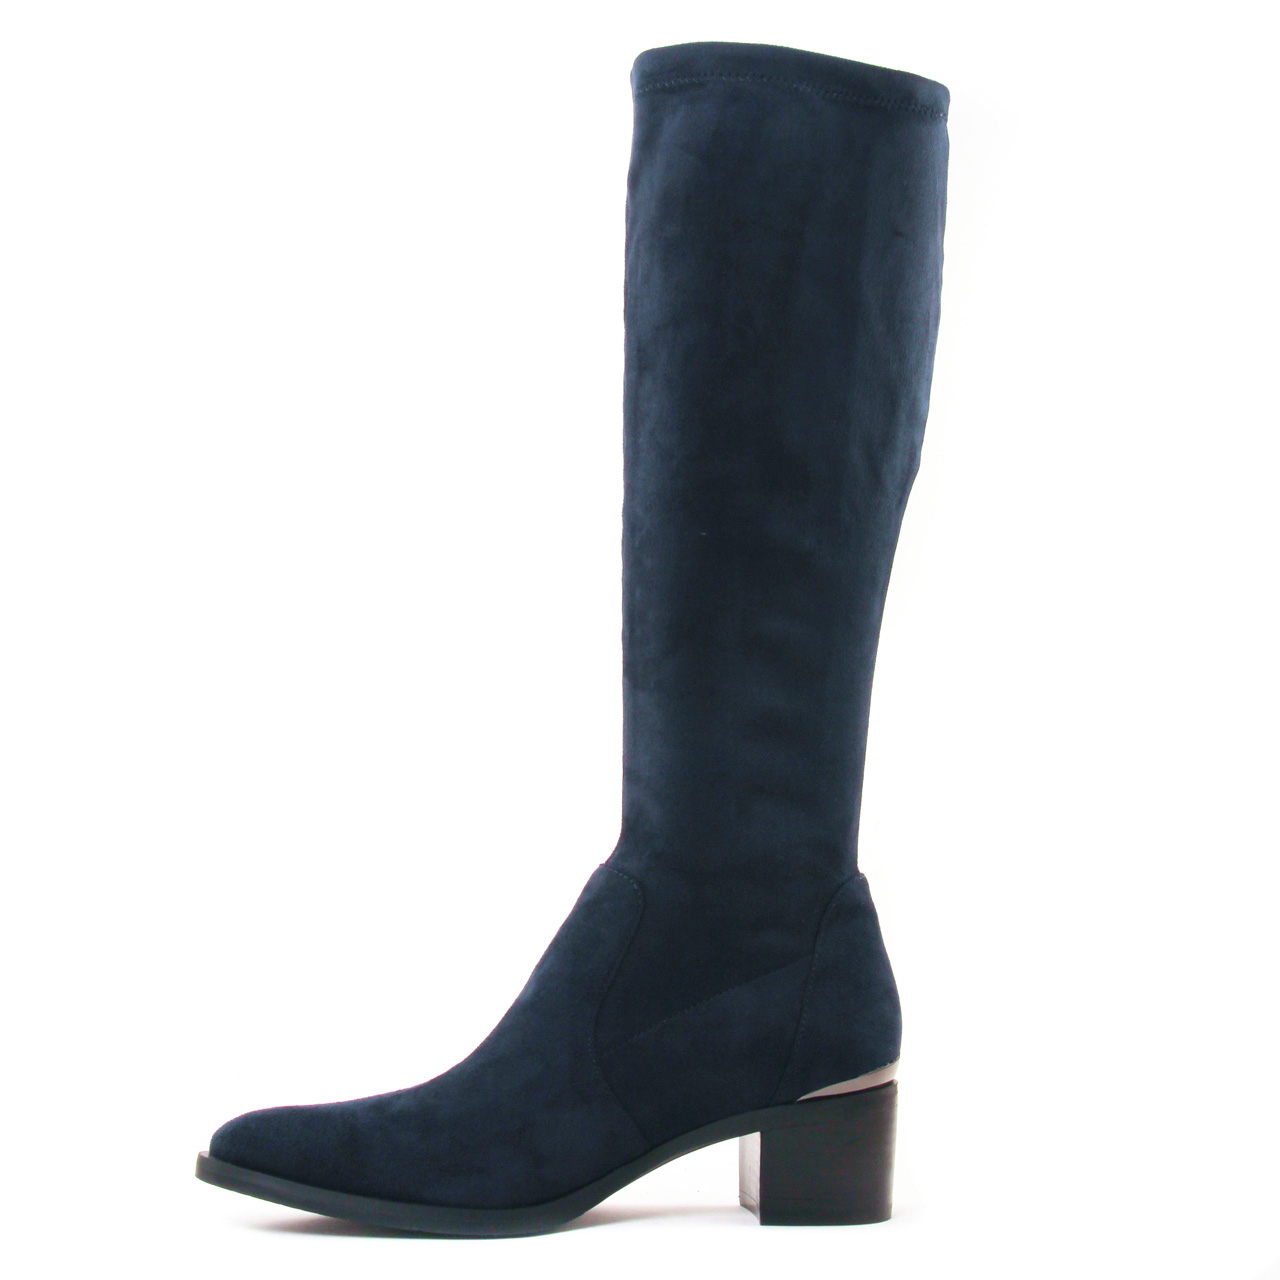 bottes stretch bleu marine mode femme automne hiver vue 3